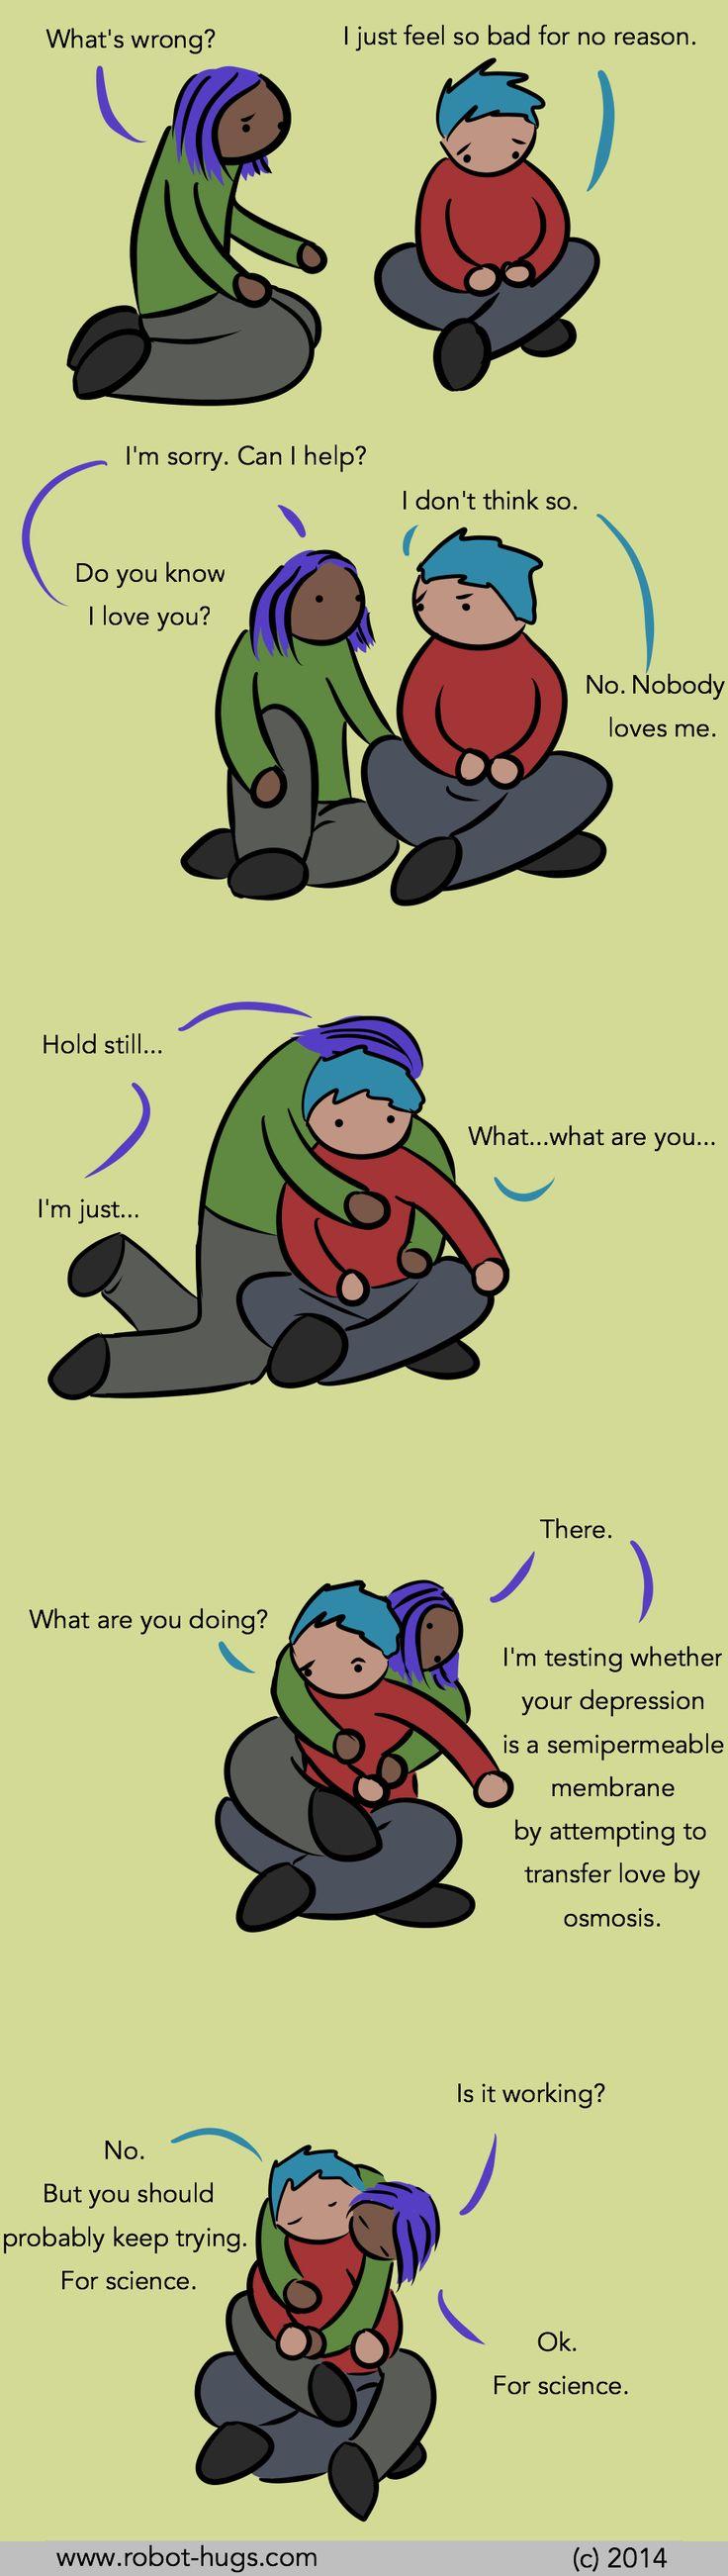 Robot Hugs: For Science (http://www.robot-hugs.com/for-science/)